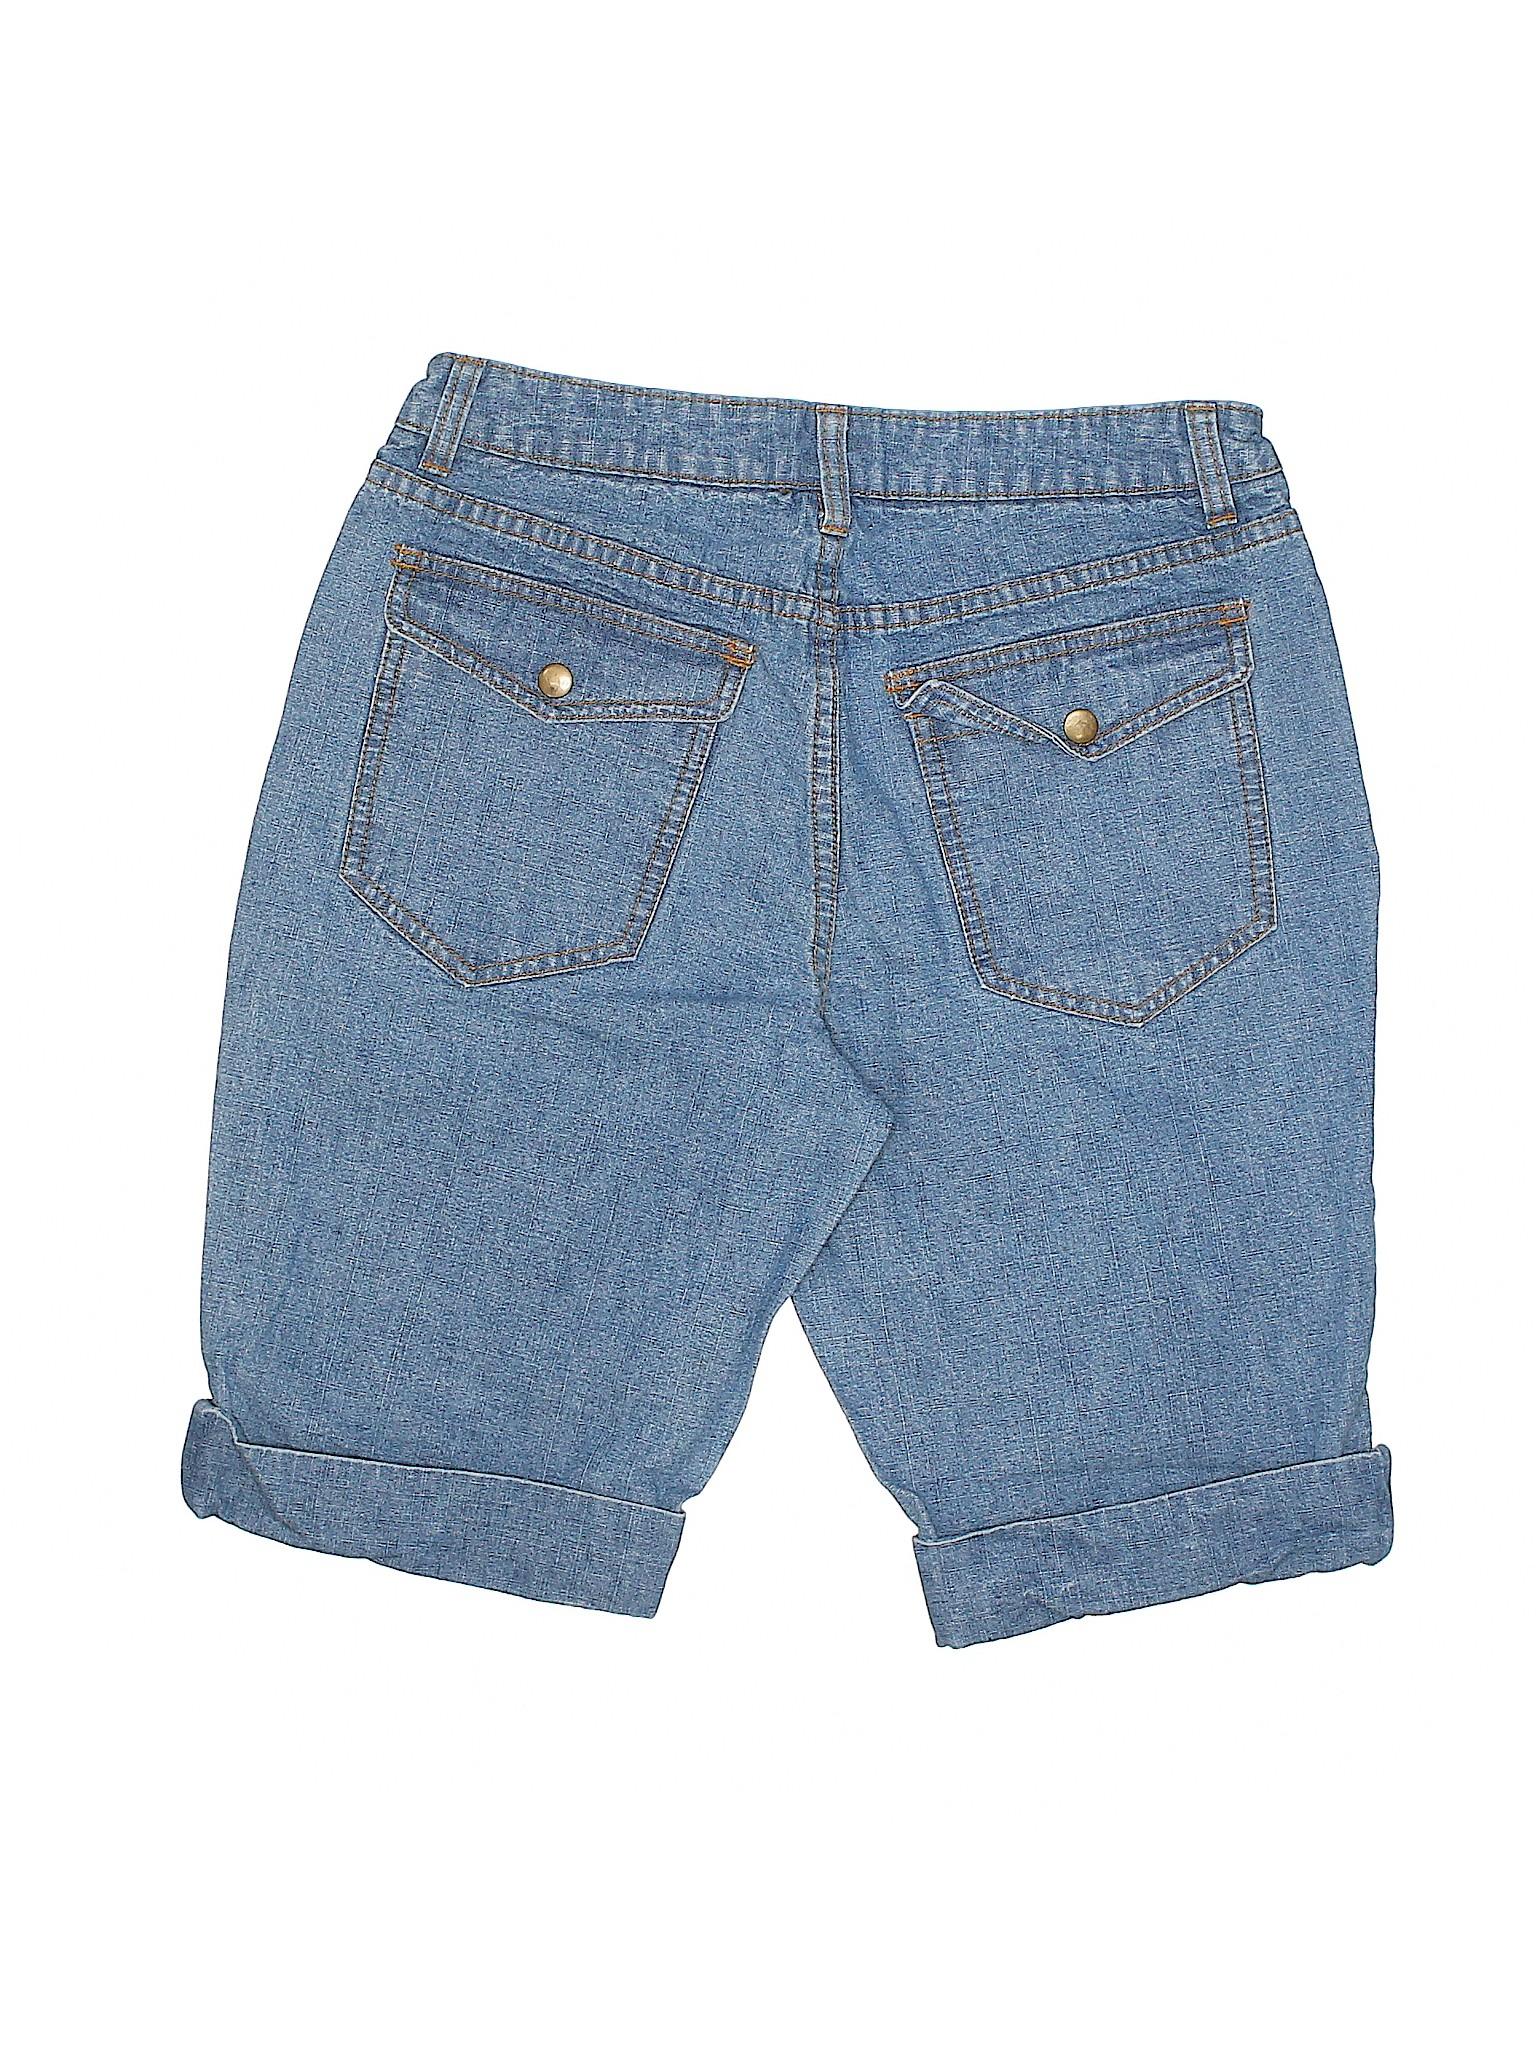 Boutique Shorts Boutique Denim Chadwicks Chadwicks qXwU0SfB